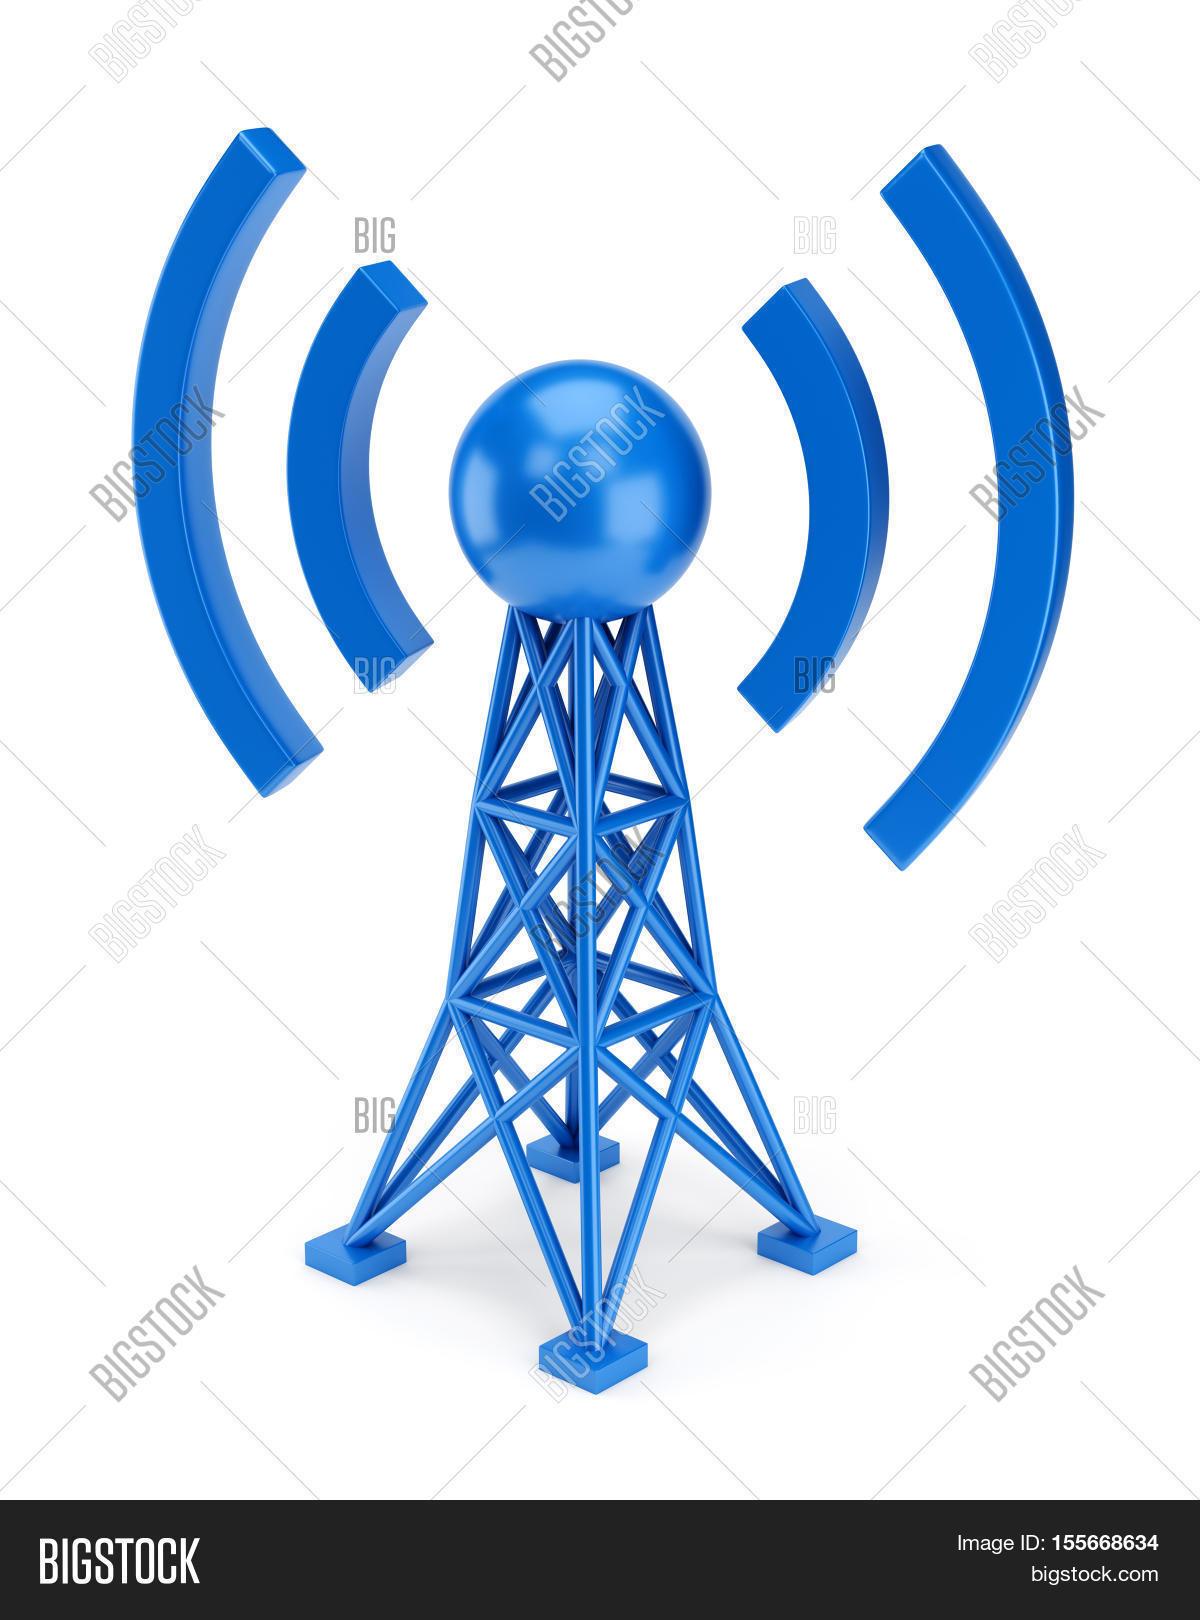 Abstract Radio Antenna Image & Photo (Free Trial) | Bigstock